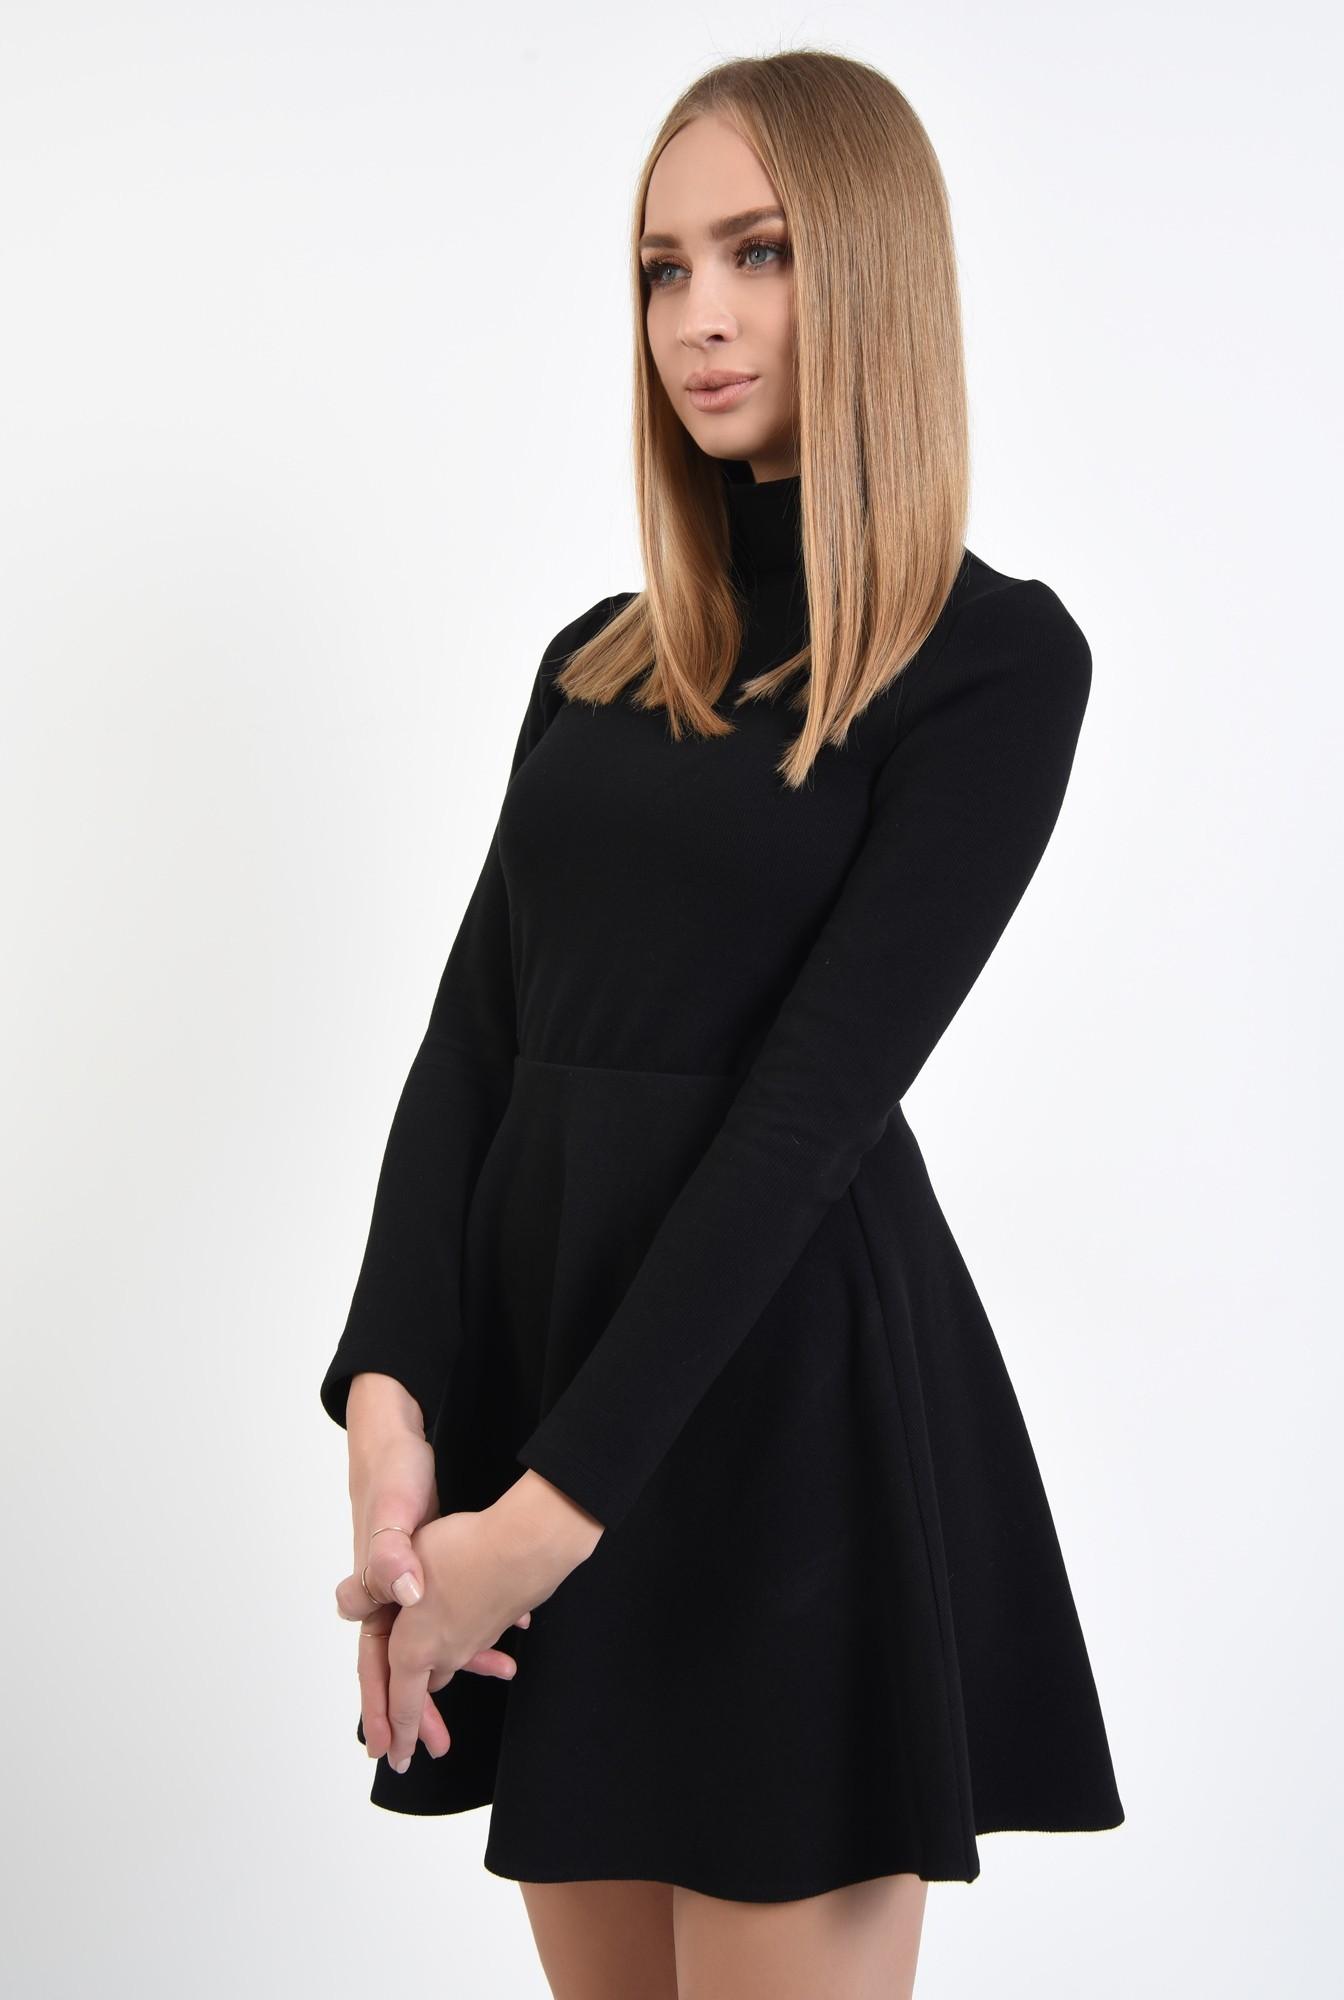 2 - fusta scurta, neagra, tricotata, croi evazat